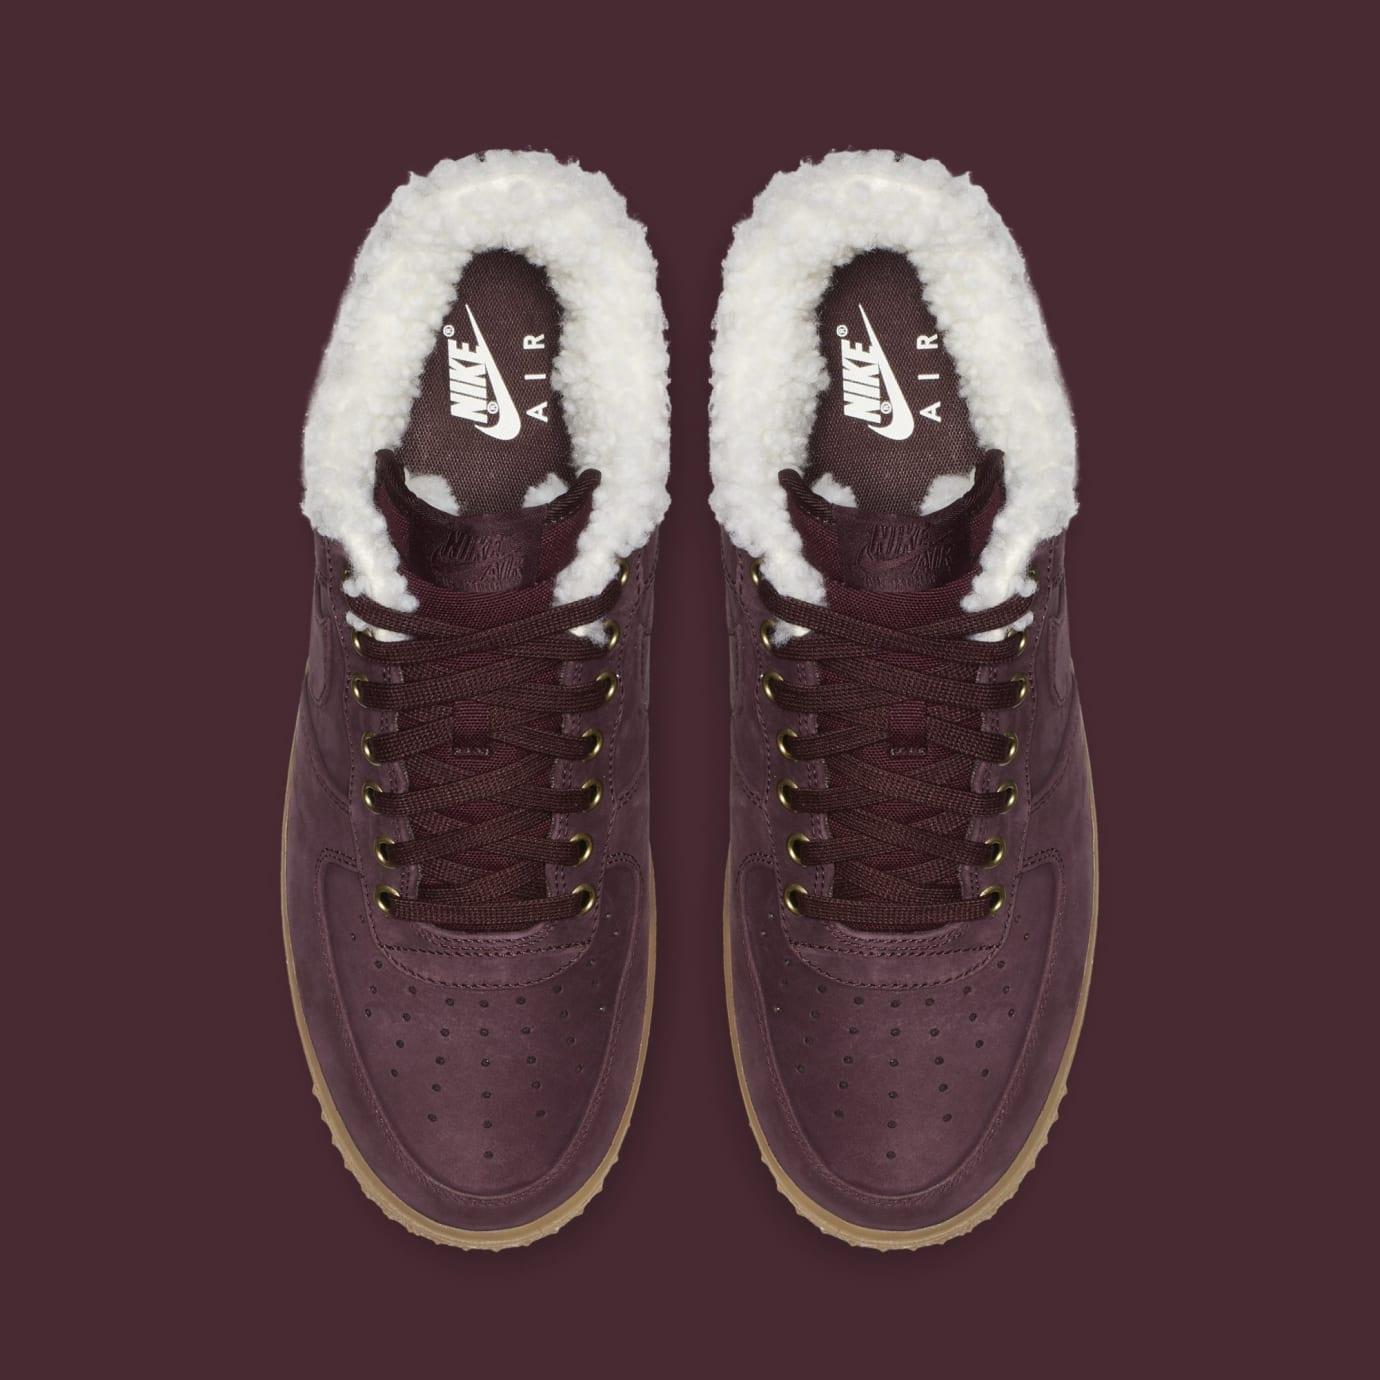 Force Nike 1 Winter Crushgum 'burgundy Air Brown Premium Light 8PNwXO0kn